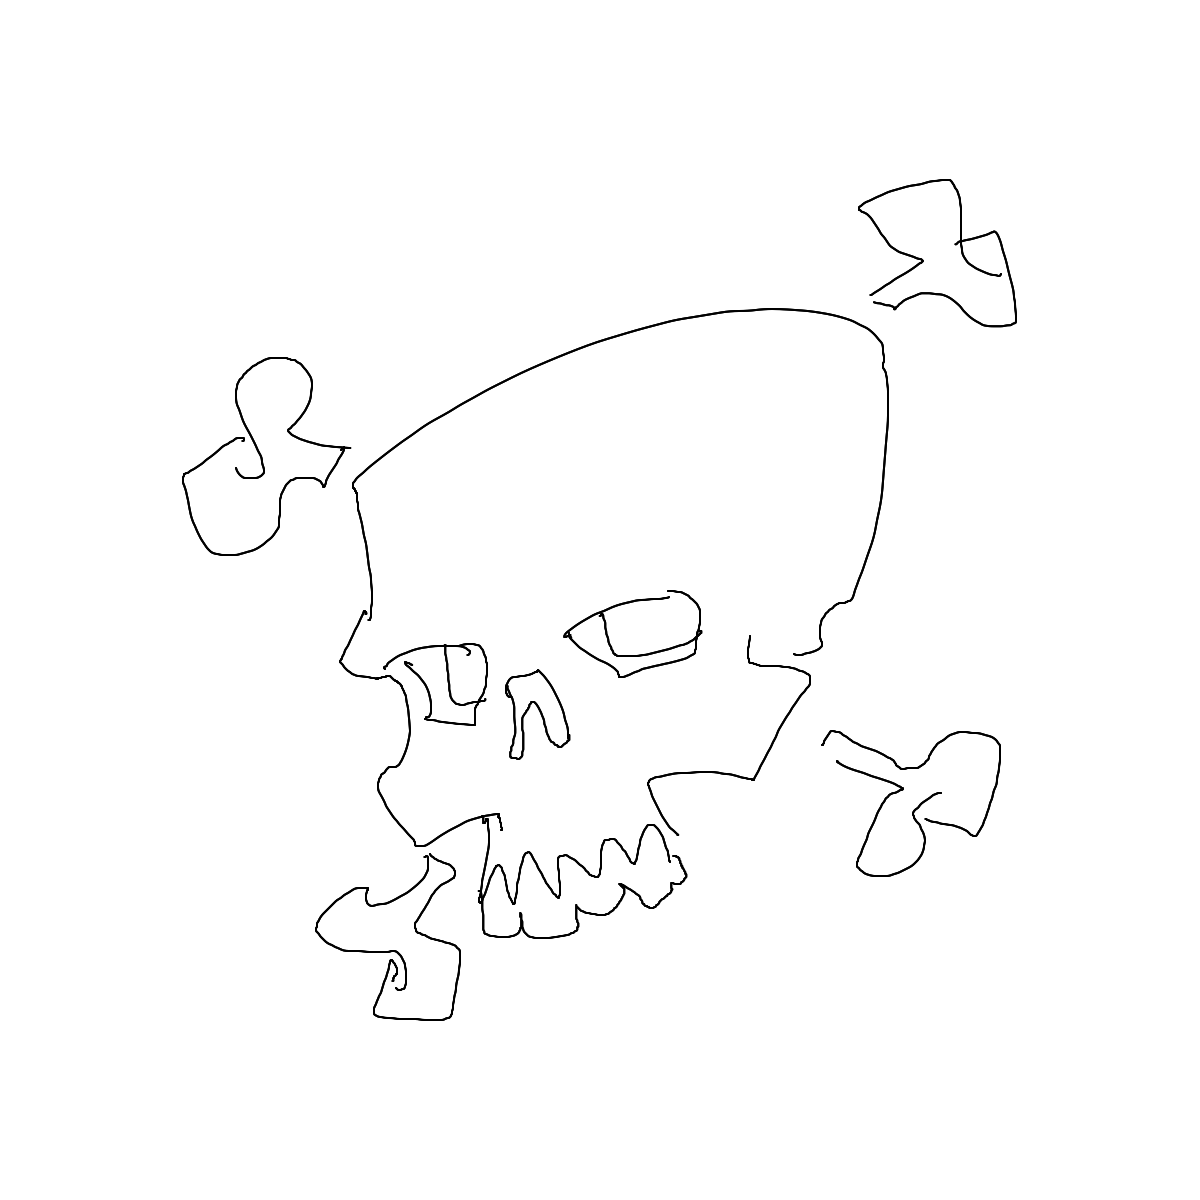 BAAAM drawing#16800 lat:50.3647308349609400lng: 8.7413043975830080